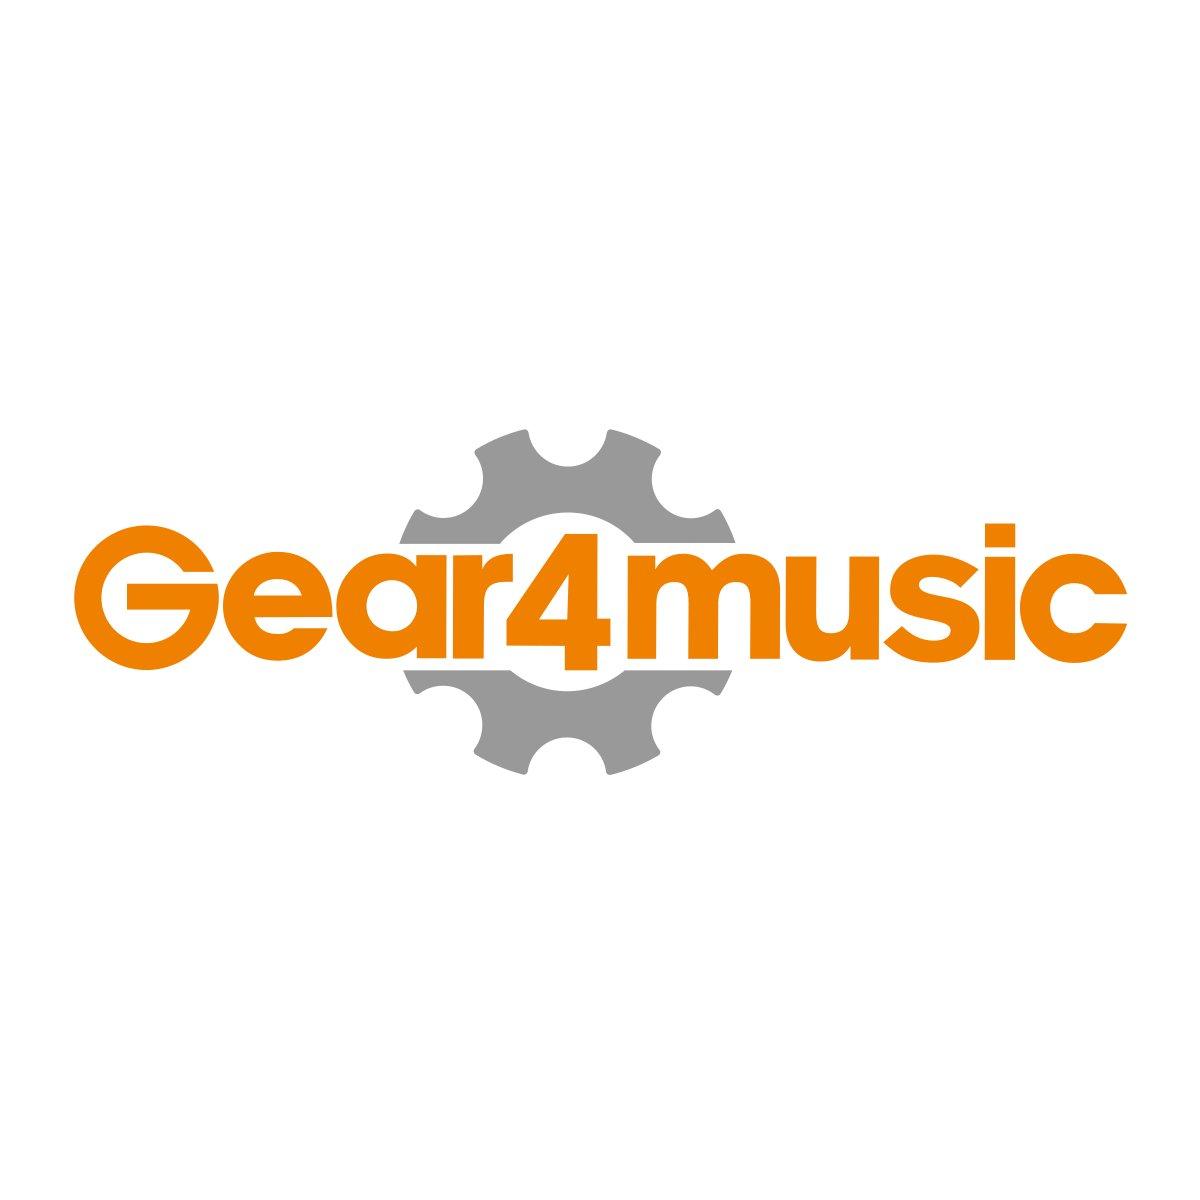 3/4-kokoinen Sähkökontrabasso Gear4musicilta, Musta